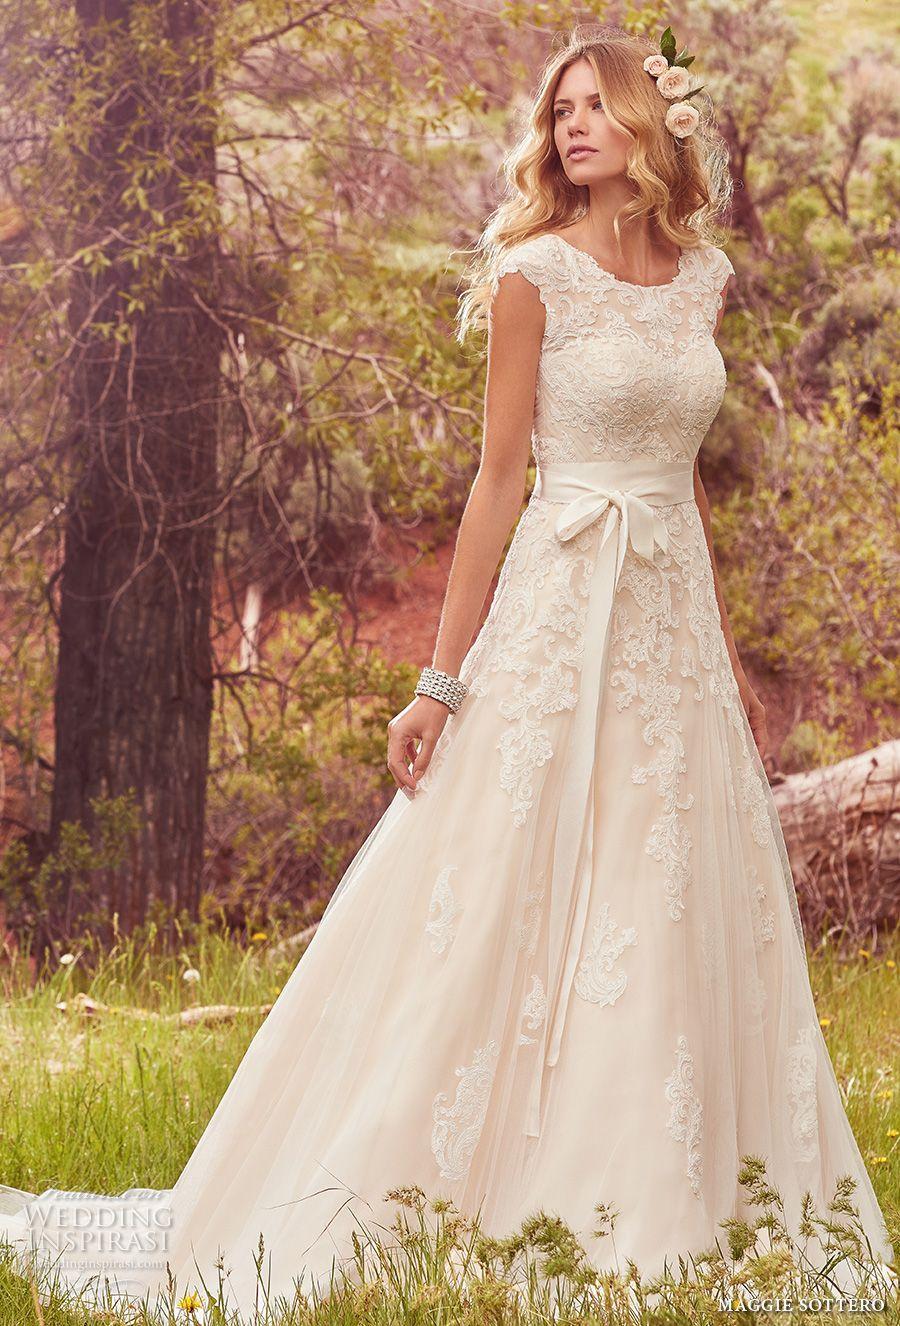 Simple Introducing Rebecca Ingram Elegant Wedding Dresses at Affordable Prices Elegant Wedding DressMaggie SotteroDiy